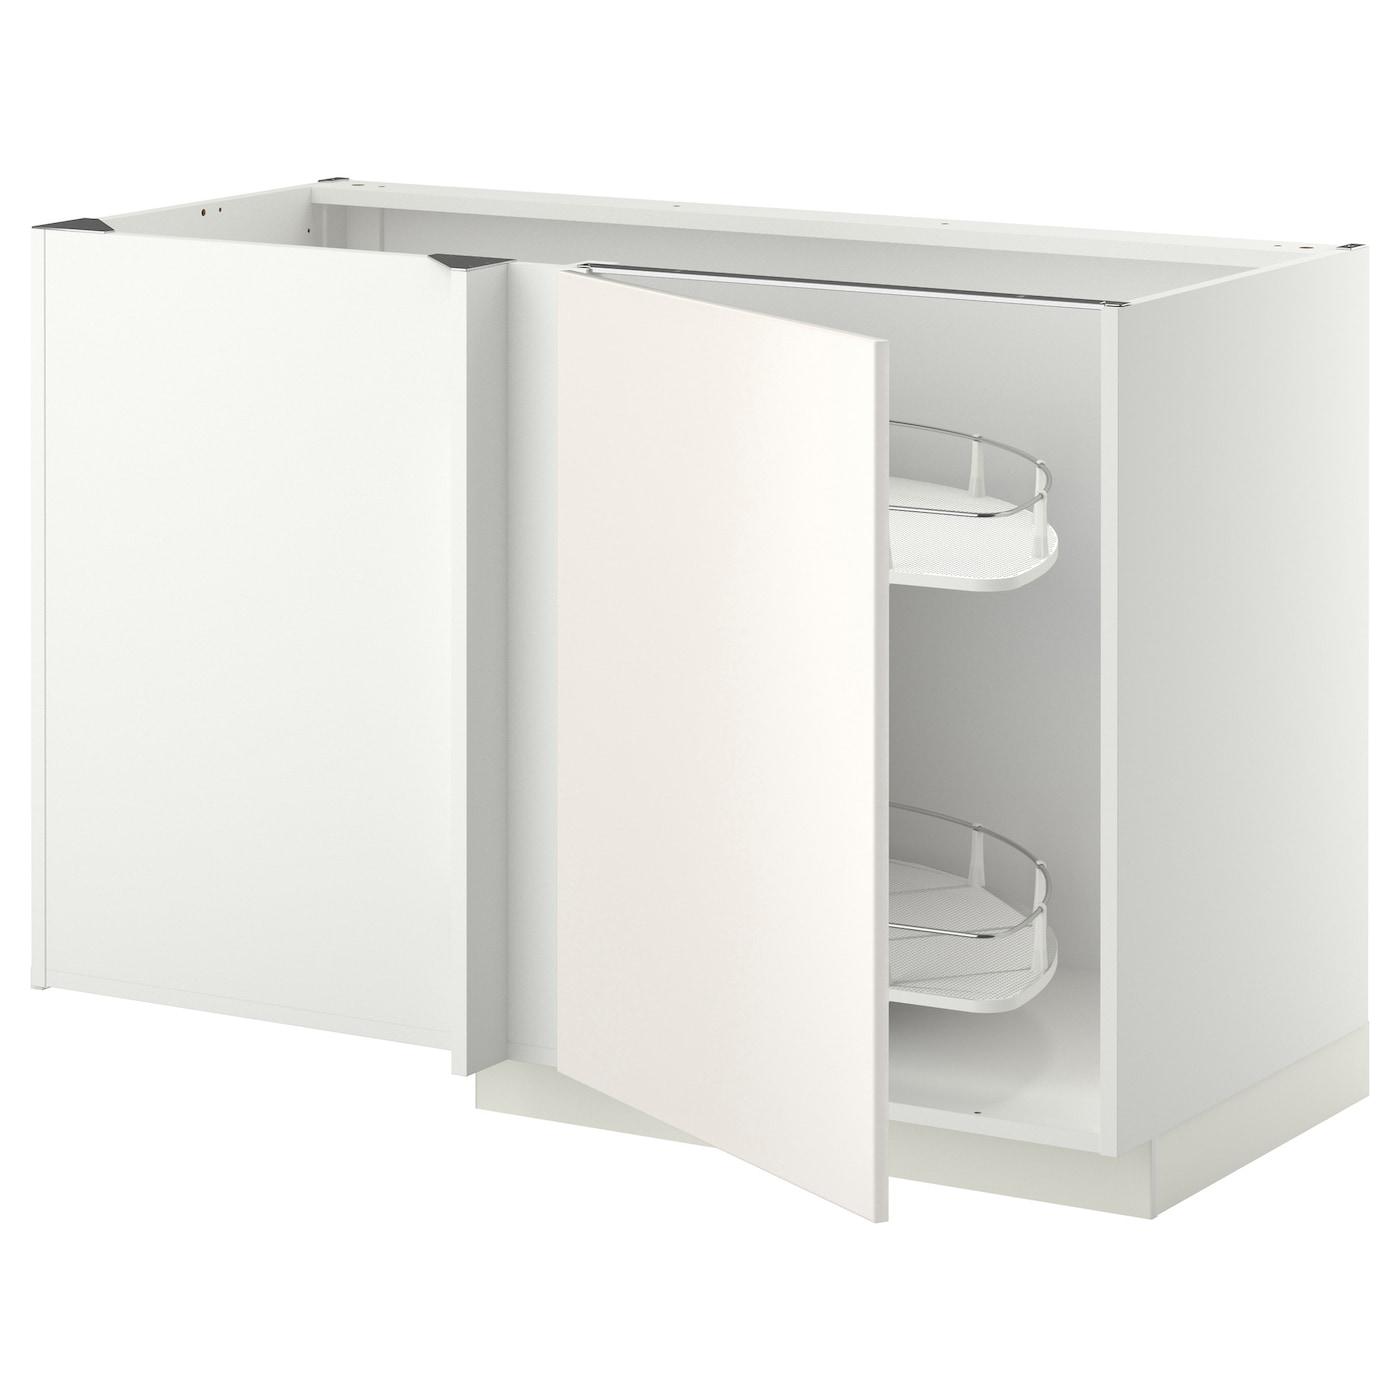 UTRUSTA Eckunterschrank-Karussell - IKEA